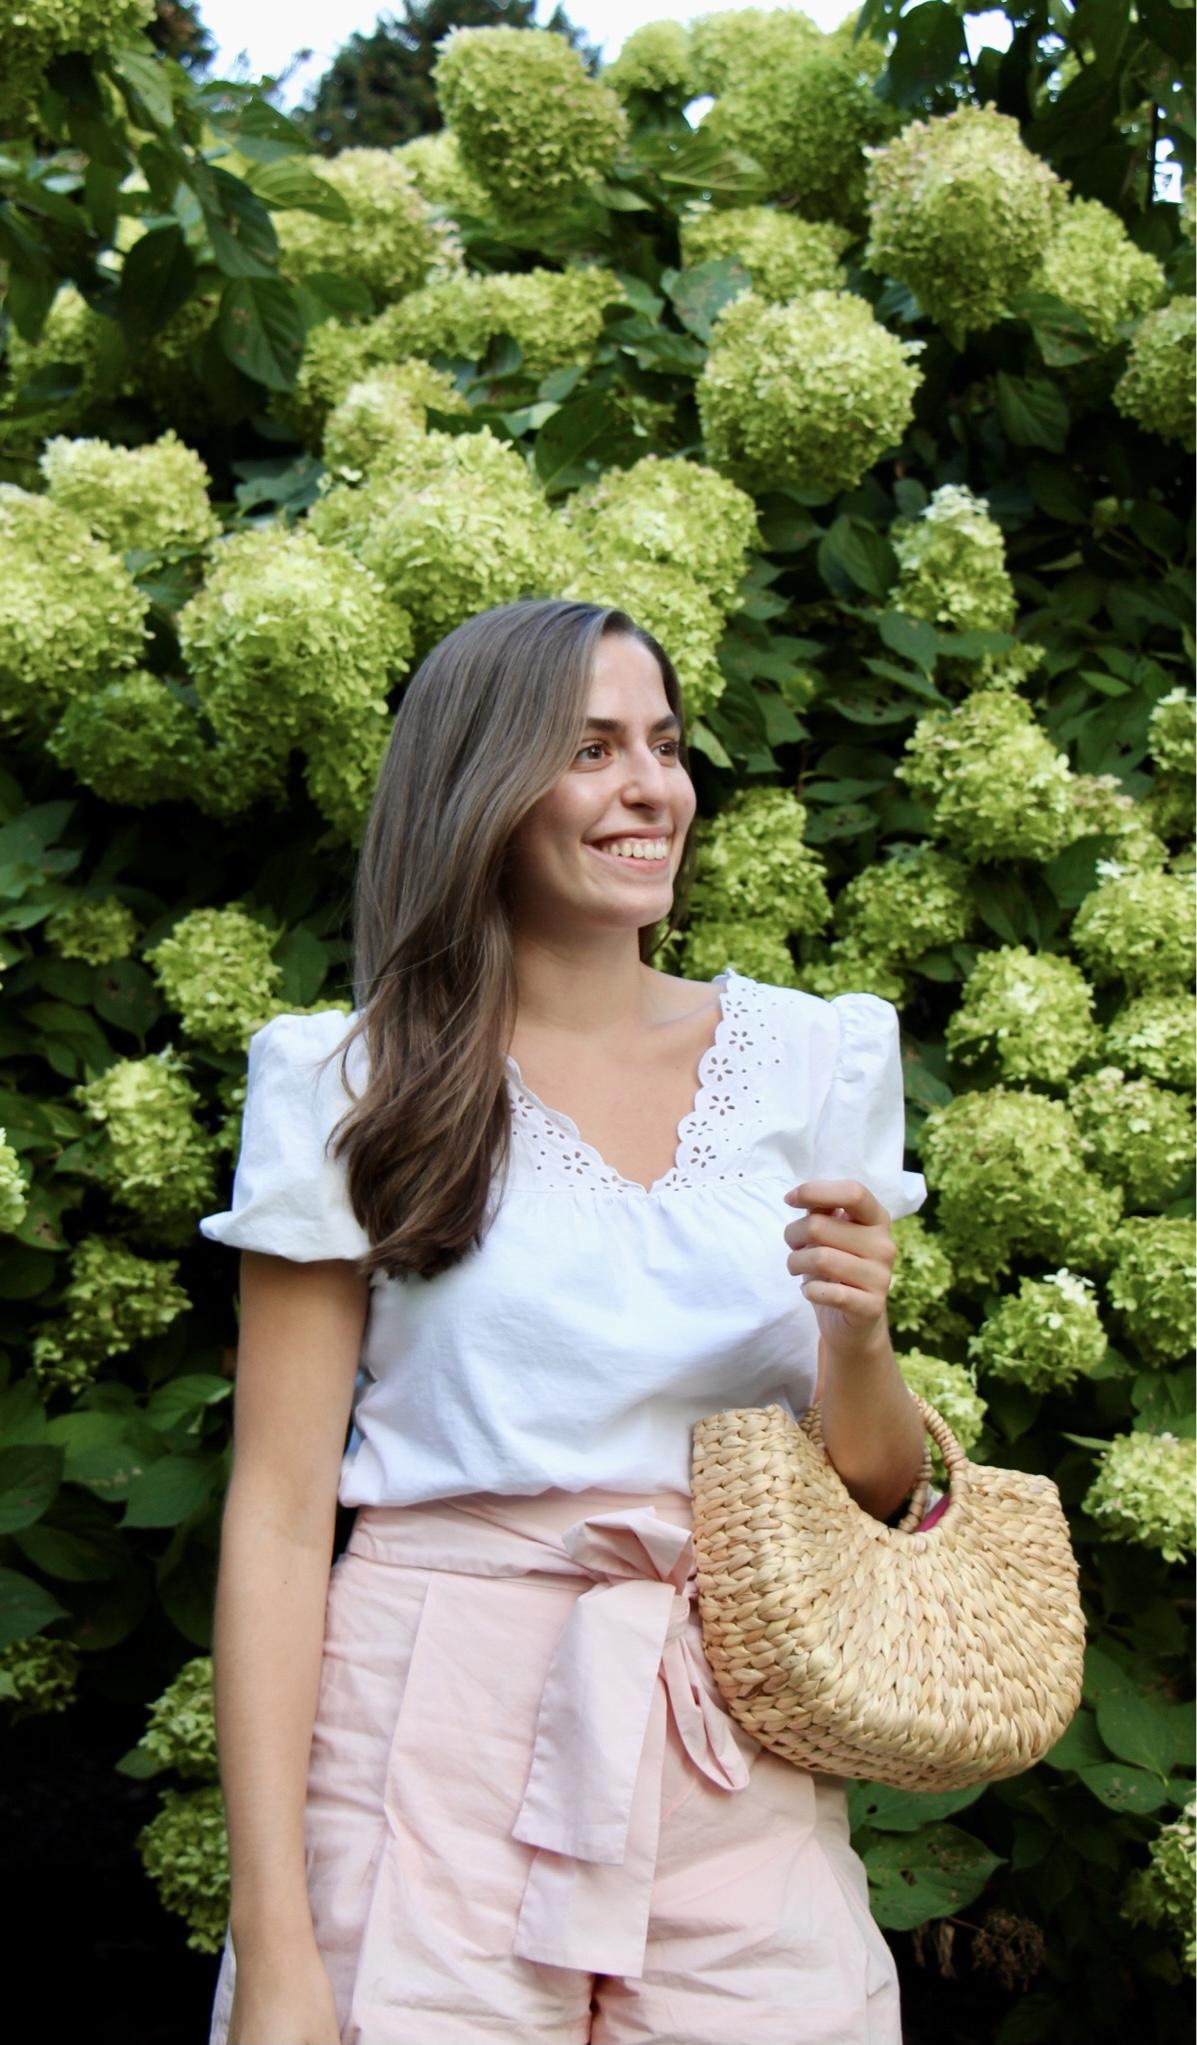 pink shorts, white puff sleeve top, straw bag, hydrangeas